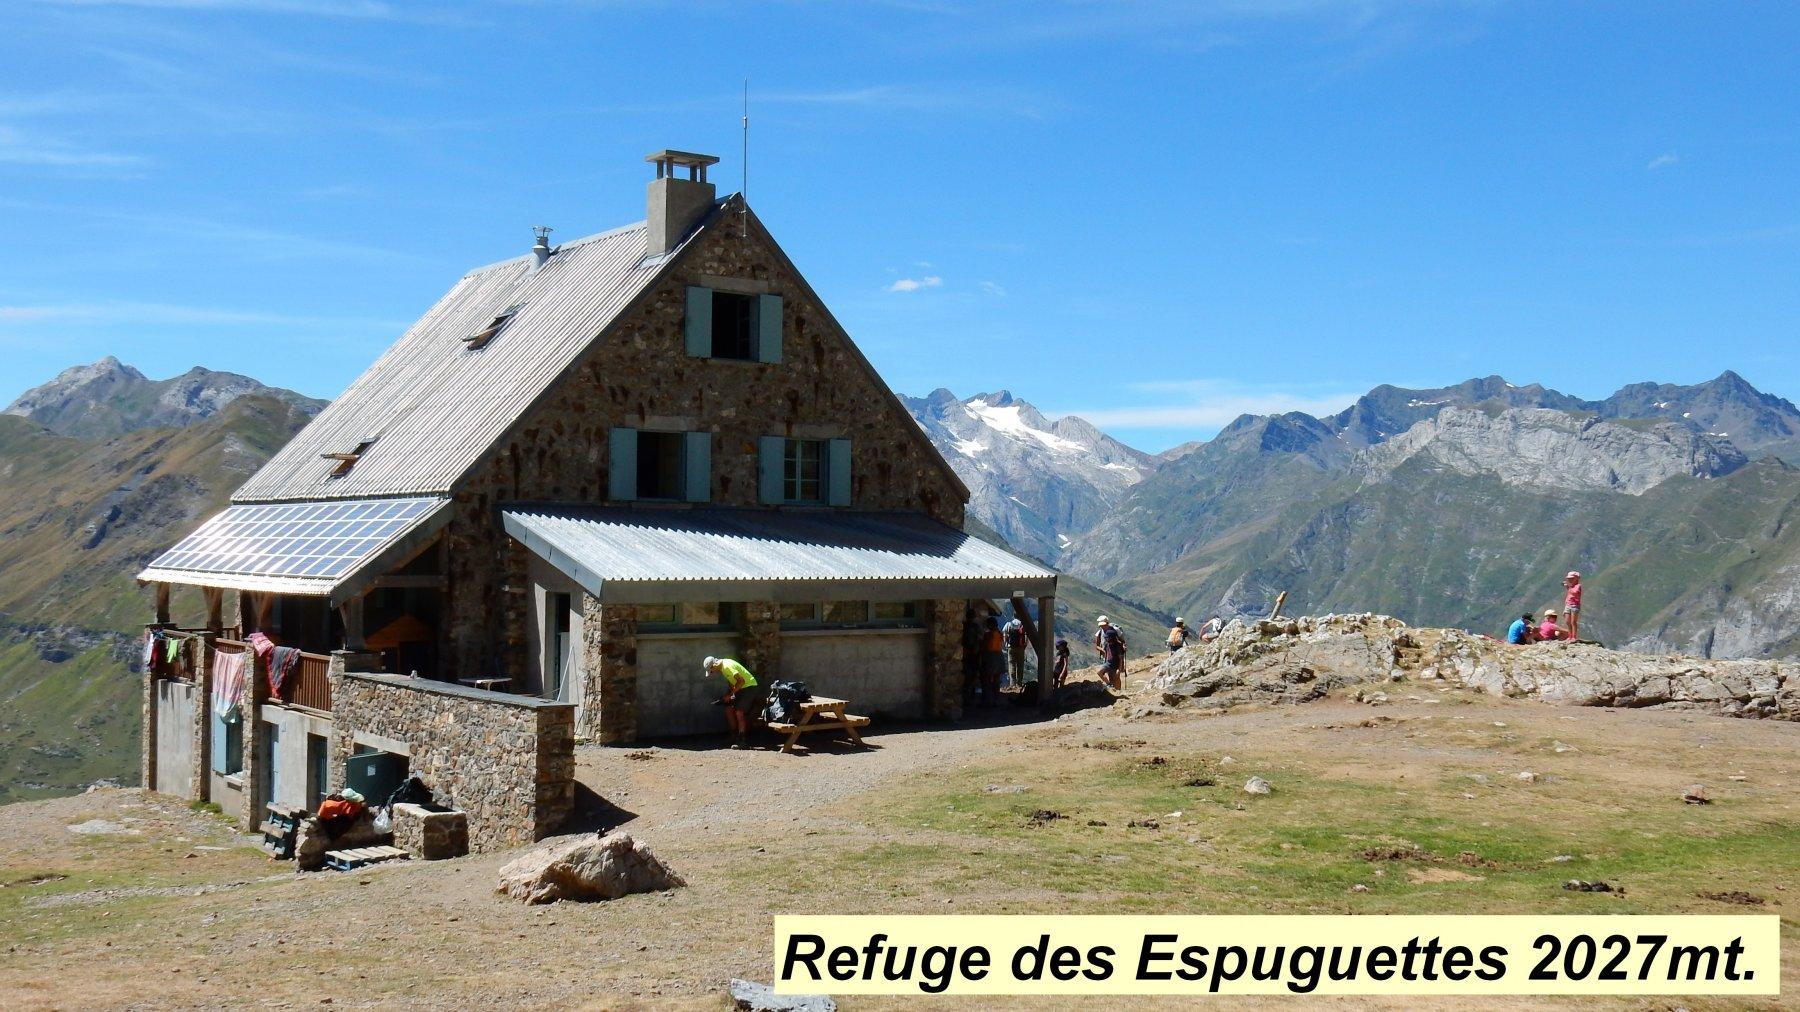 Trek Pirenei Ordesa Gavarnie Tappa 4 : Dallo Chalet la Grange de Holle al Ref. des Espuguettes 2016-08-12